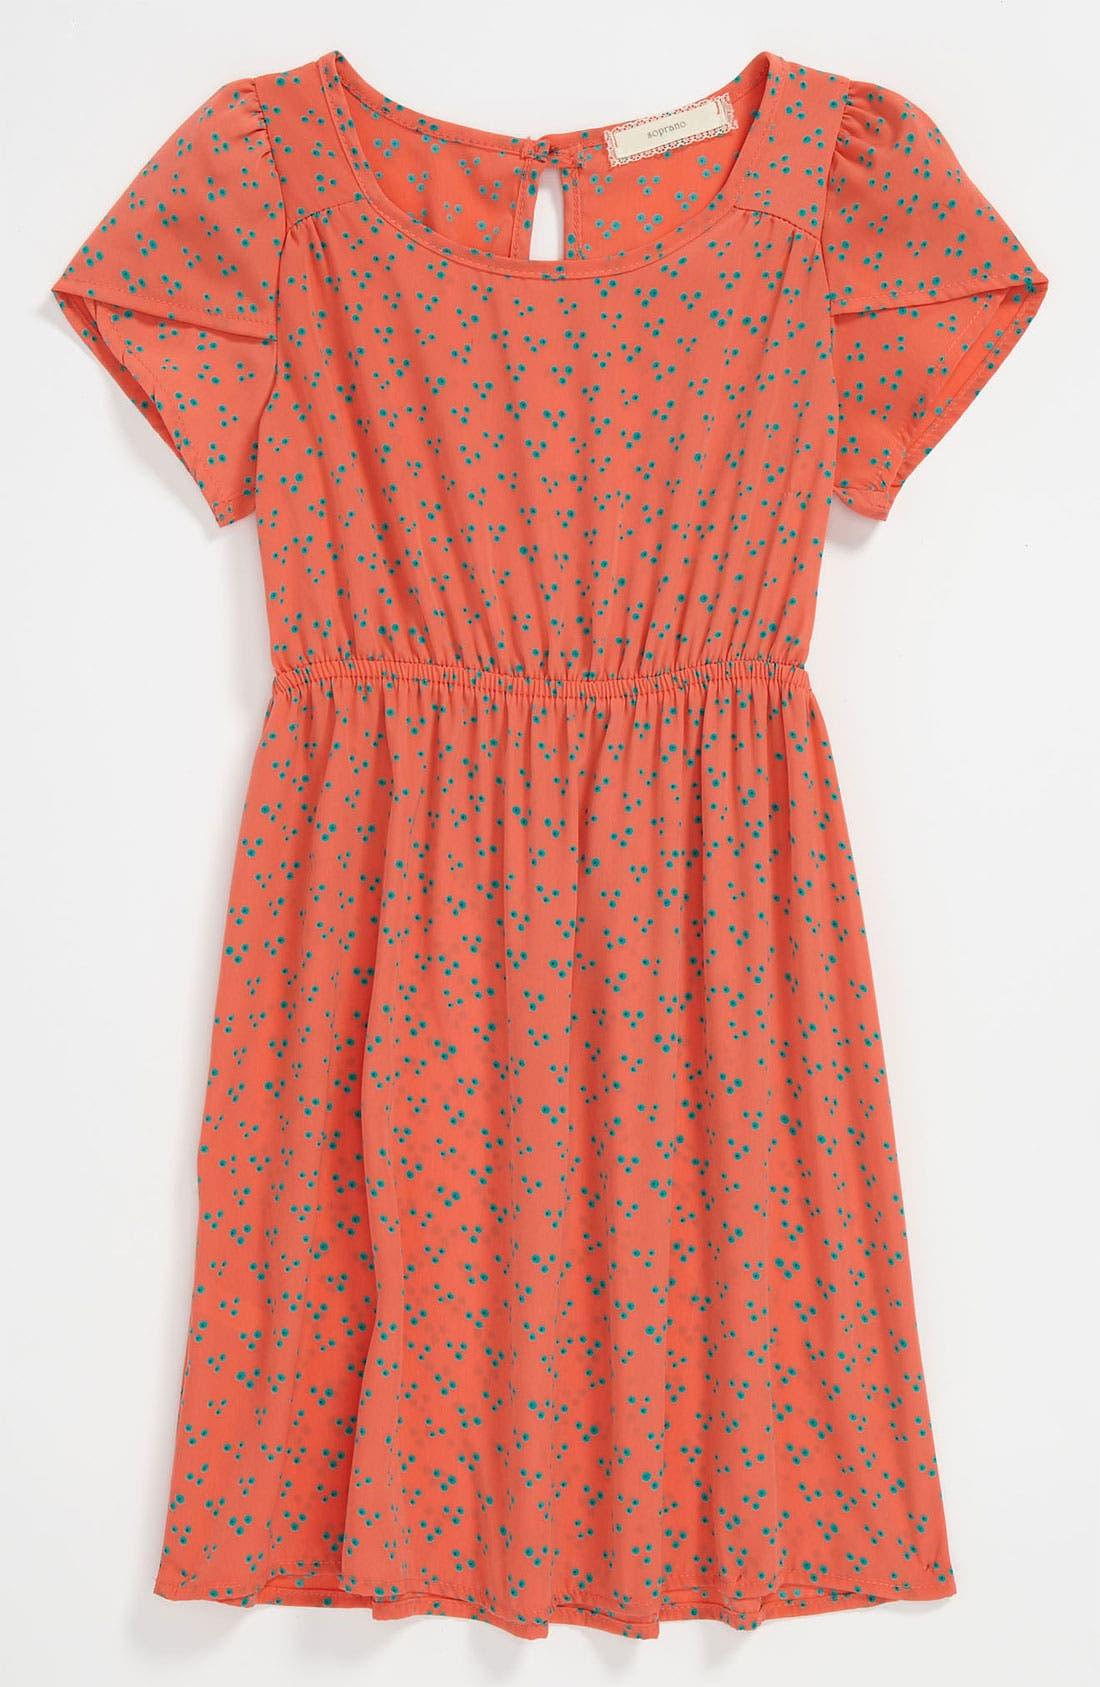 Alternate Image 1 Selected - Soprano Print Dress (Little Girls & Big Girls)